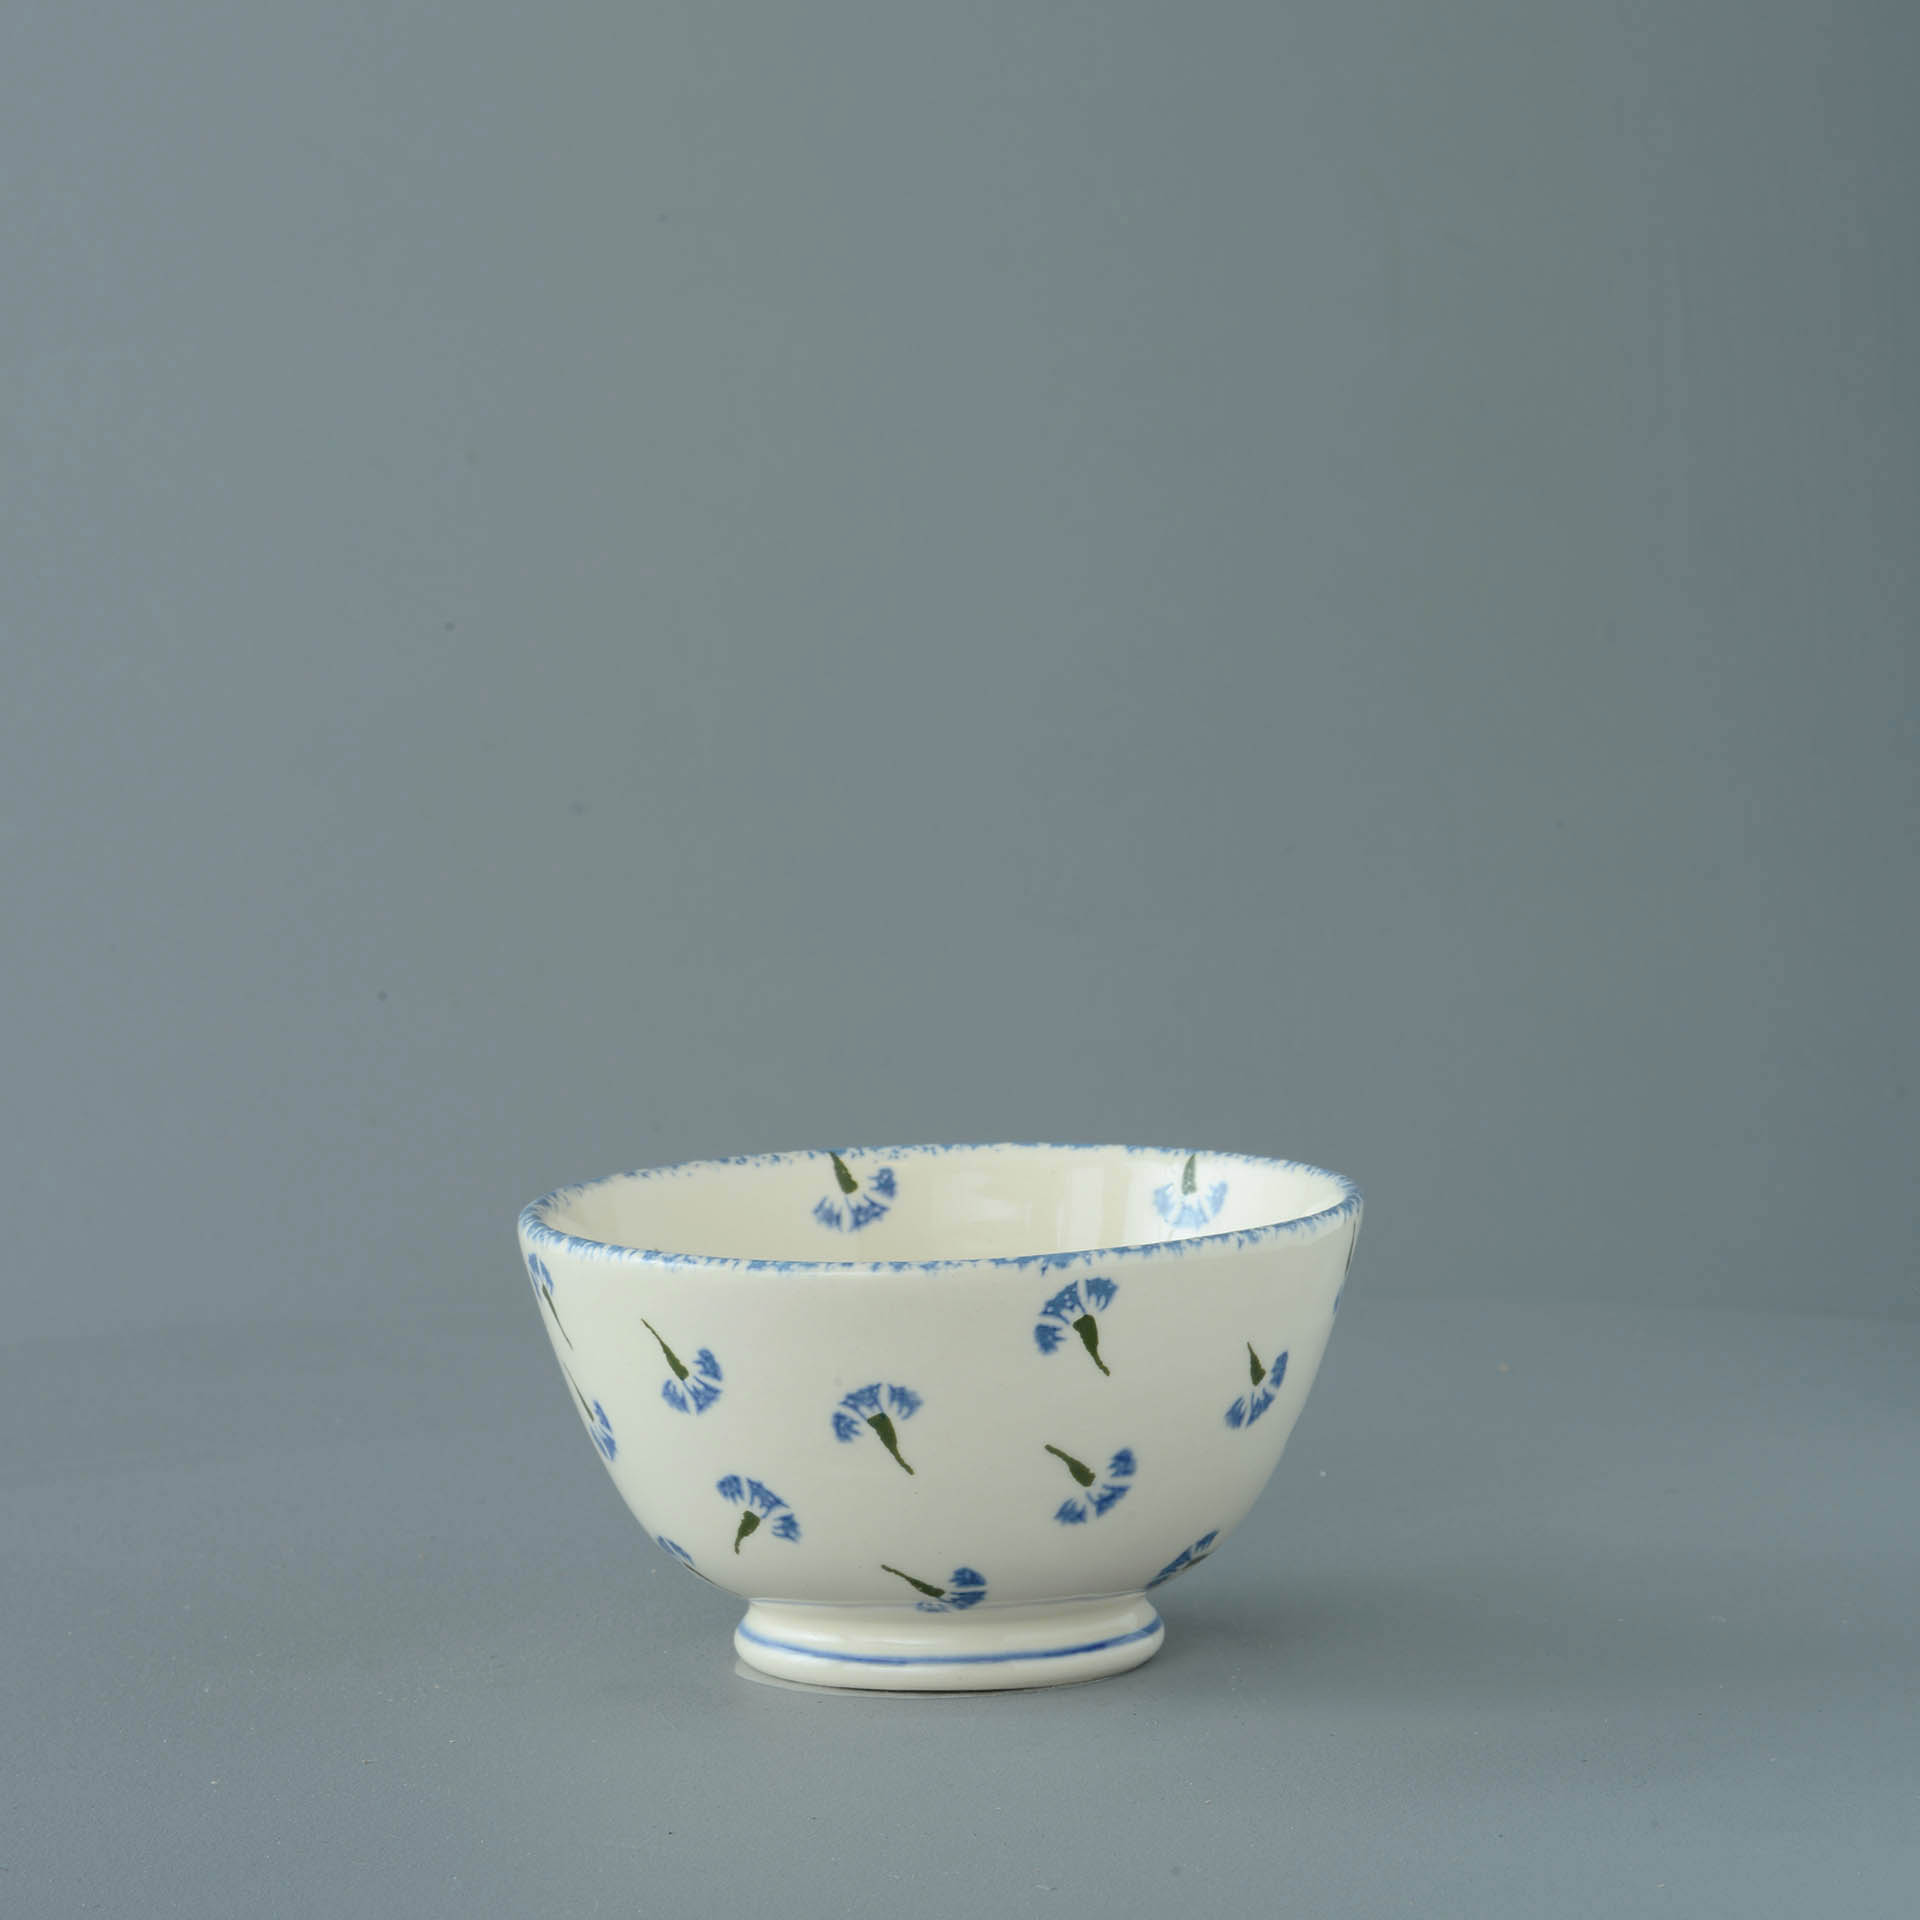 Cornflower Small Bowl 6.5 x 12 cm